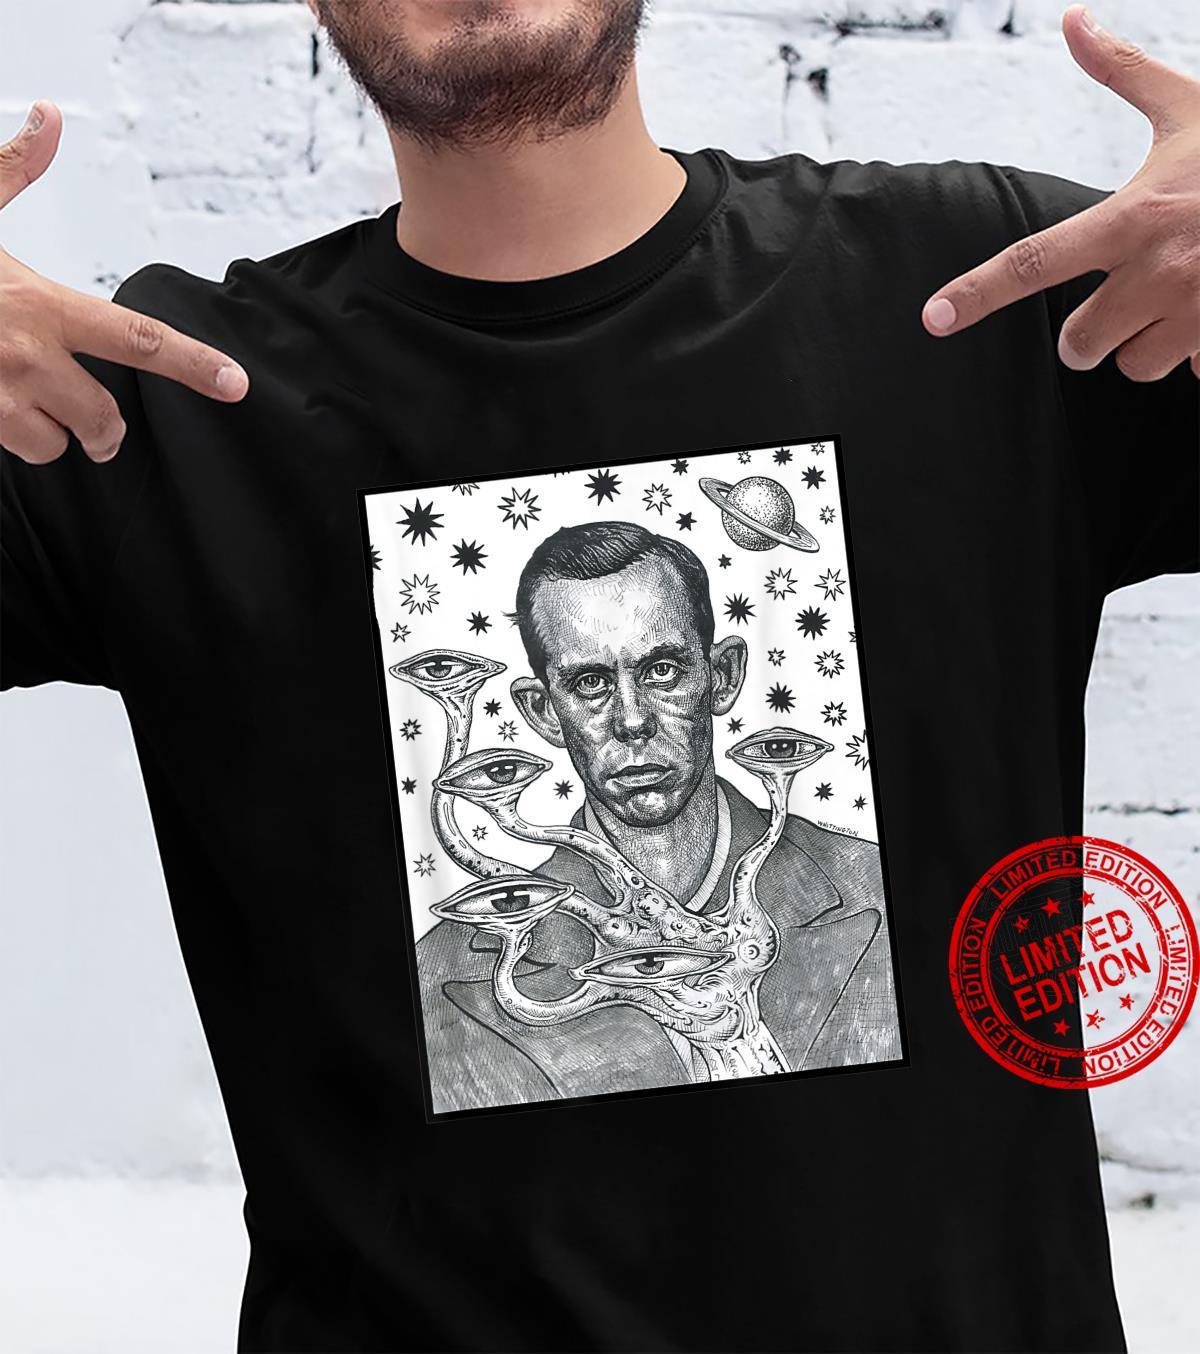 Cosmic Charlie Shirt